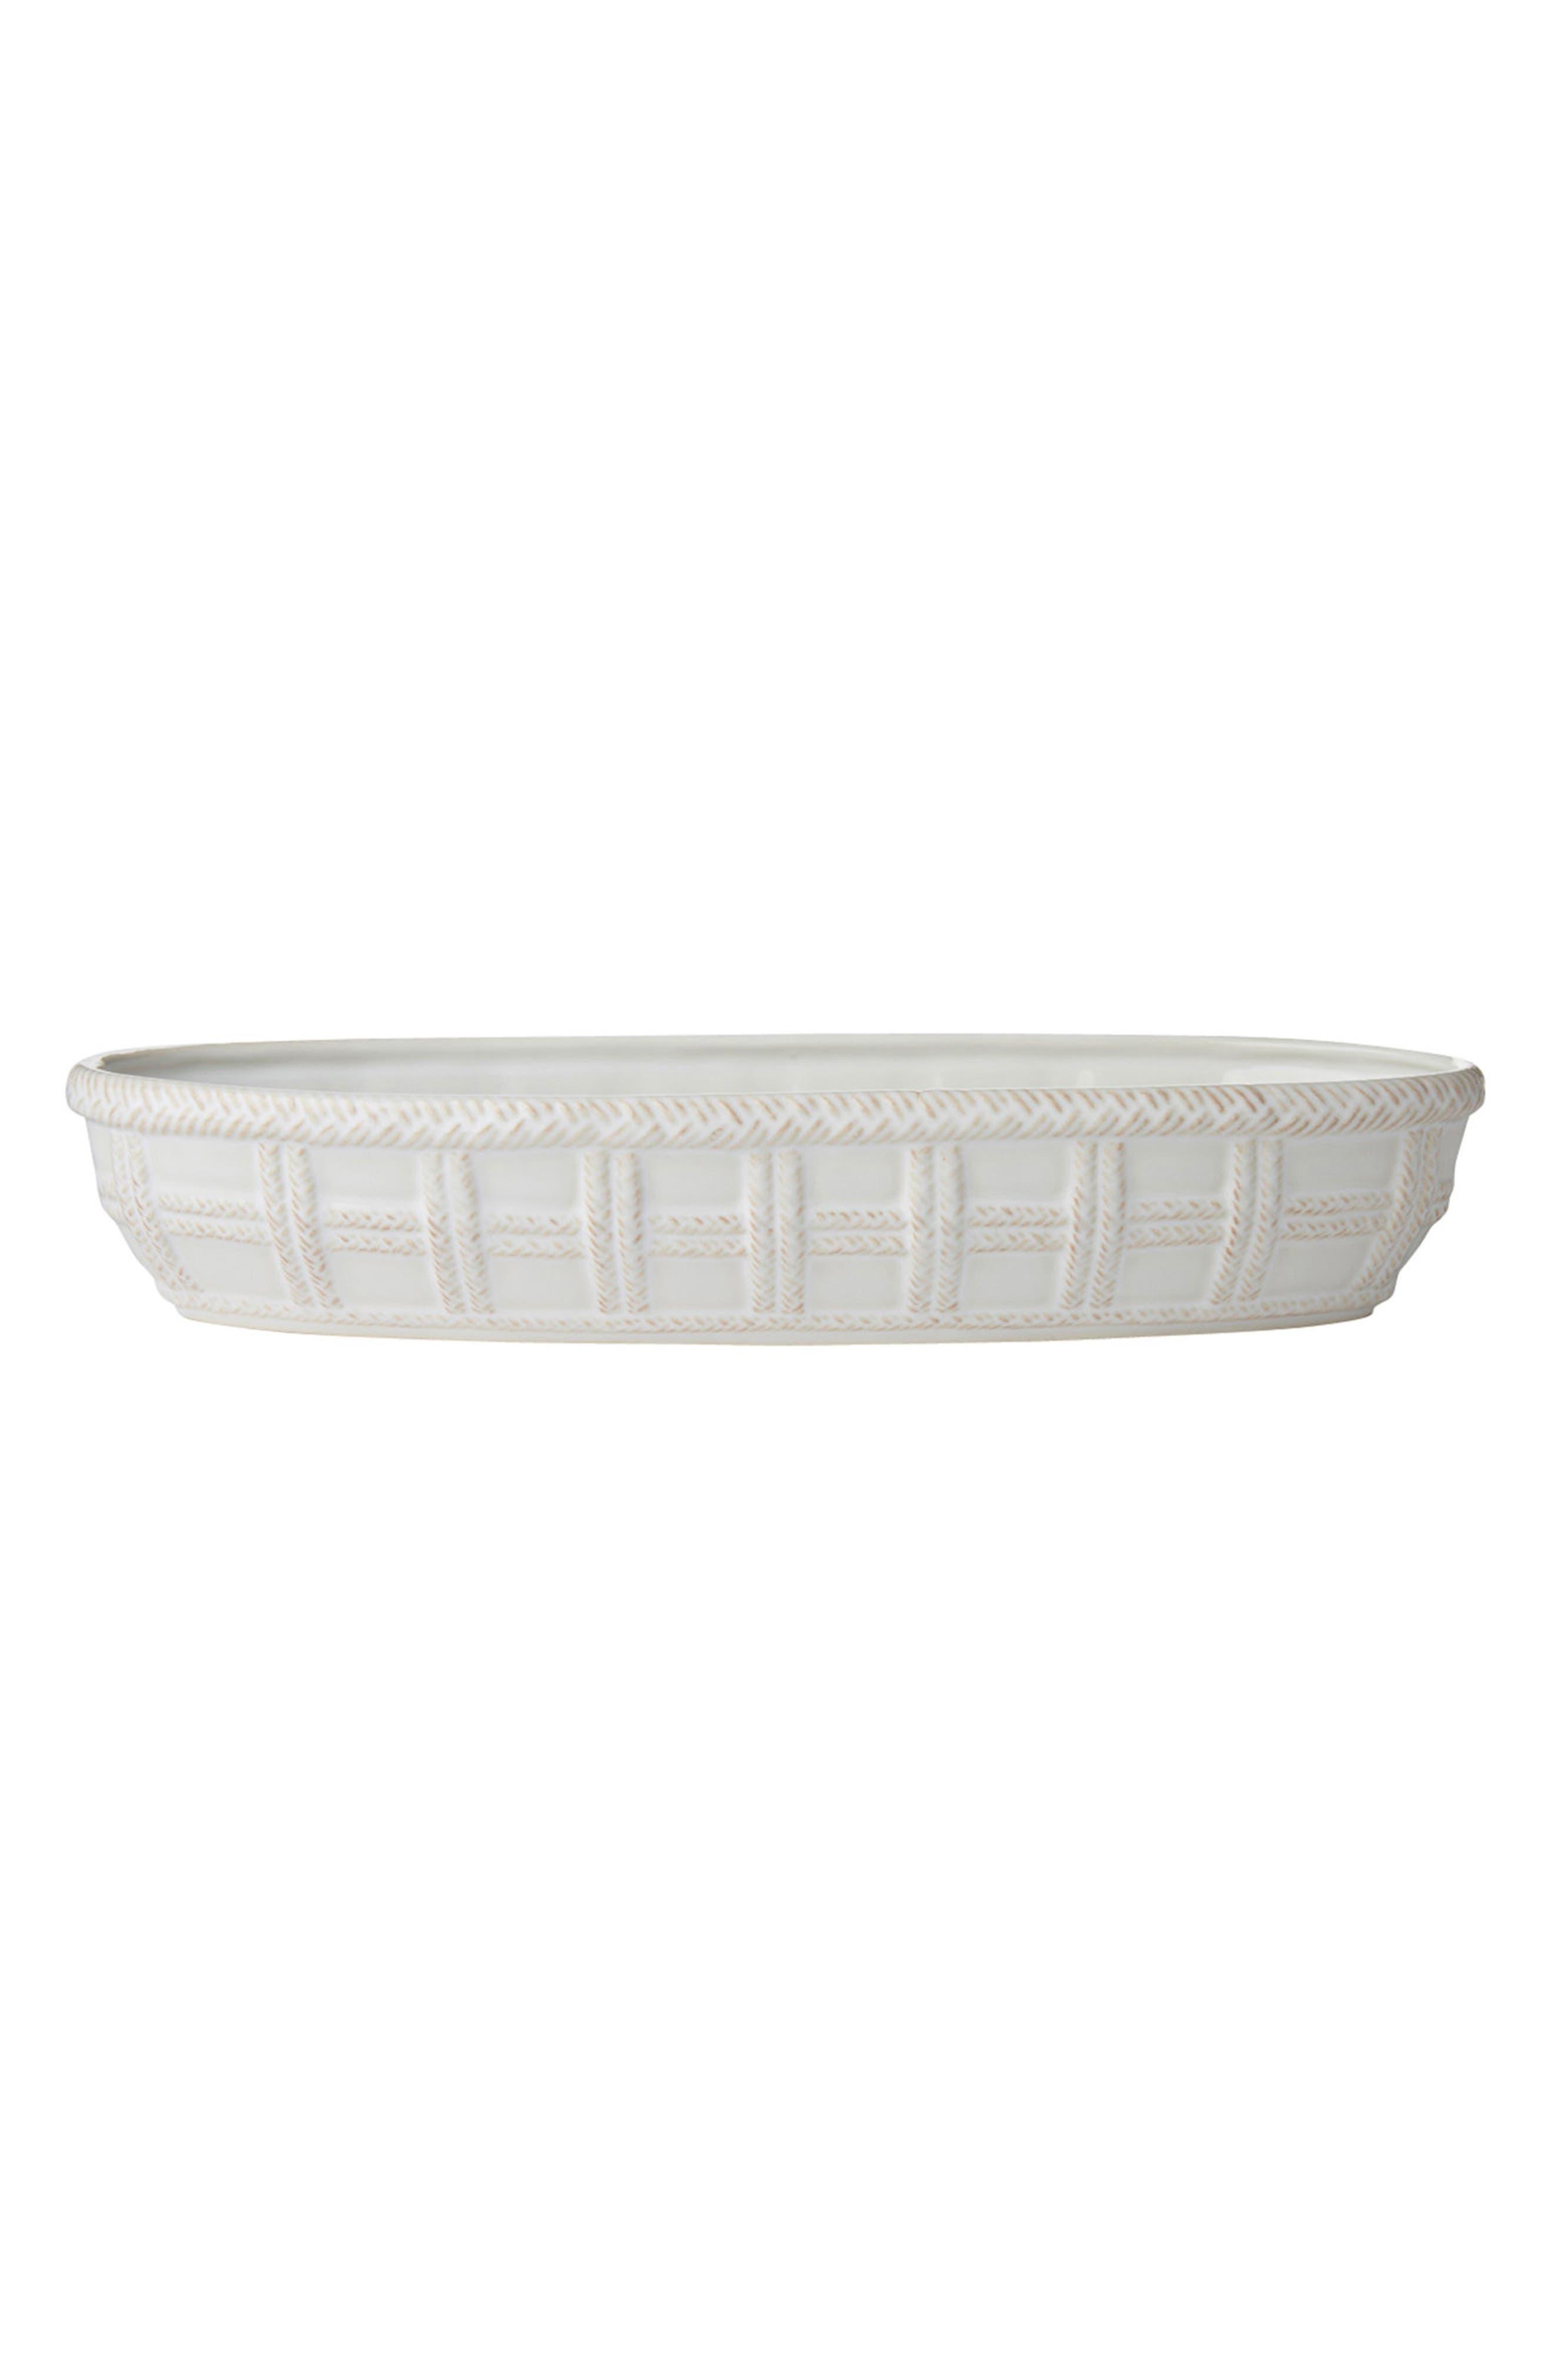 Le Panier Ceramic Bread Basket,                             Main thumbnail 1, color,                             WHITEWASH